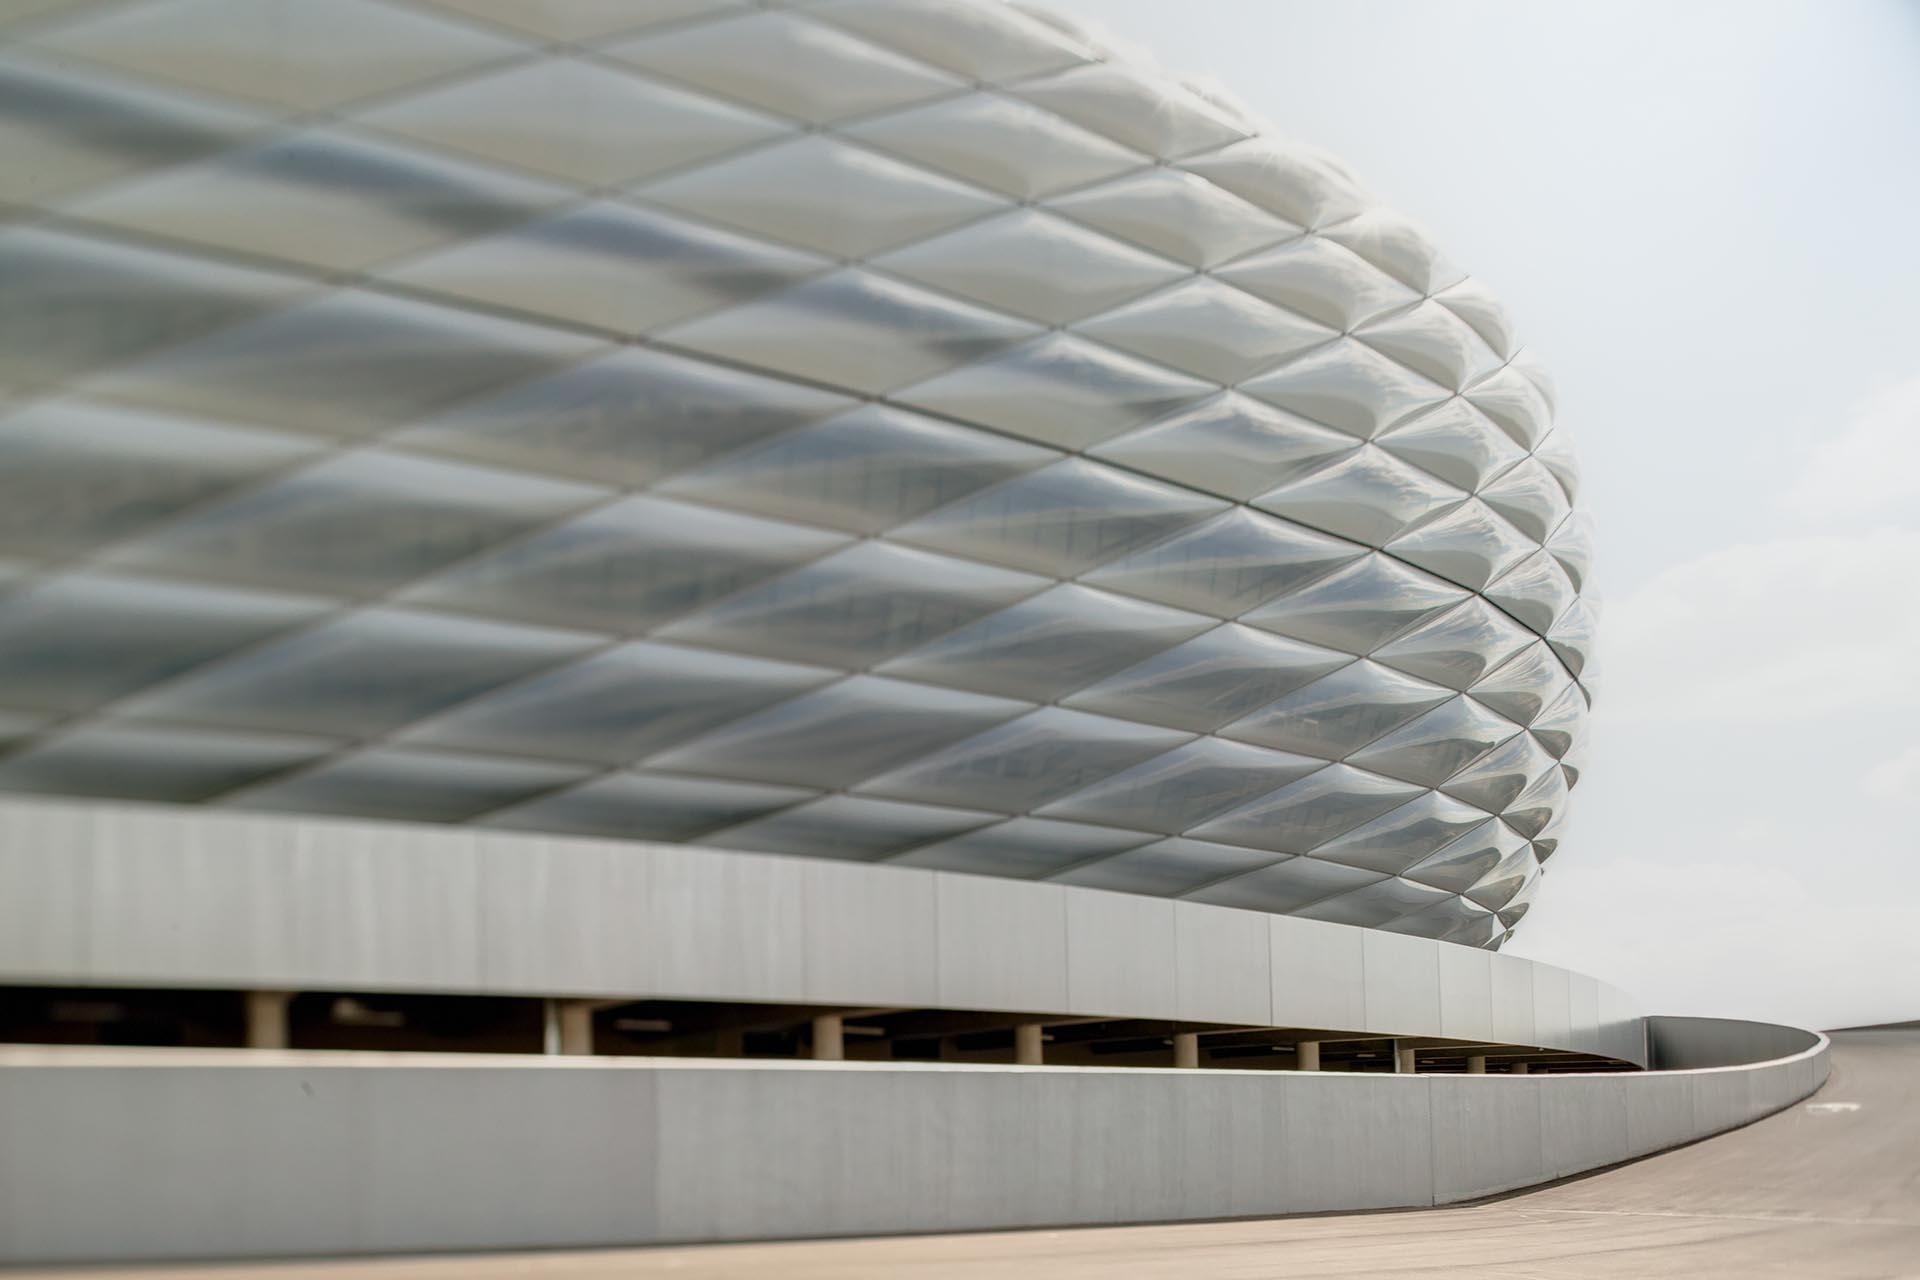 Stadionfotografie Allianz Arena/Herzog De Meuron